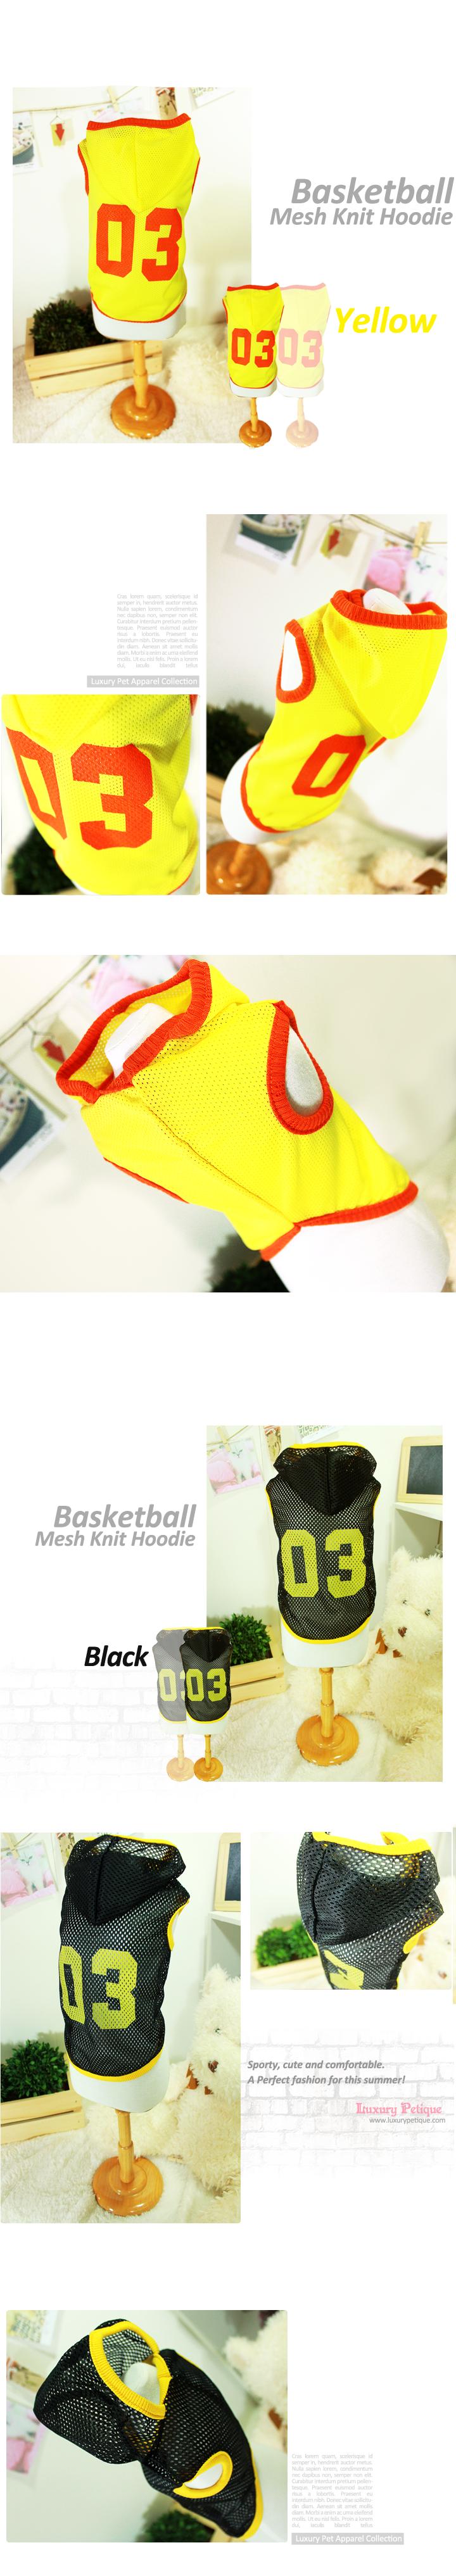 basket-ball-mesh-knit-hoodie-2.png